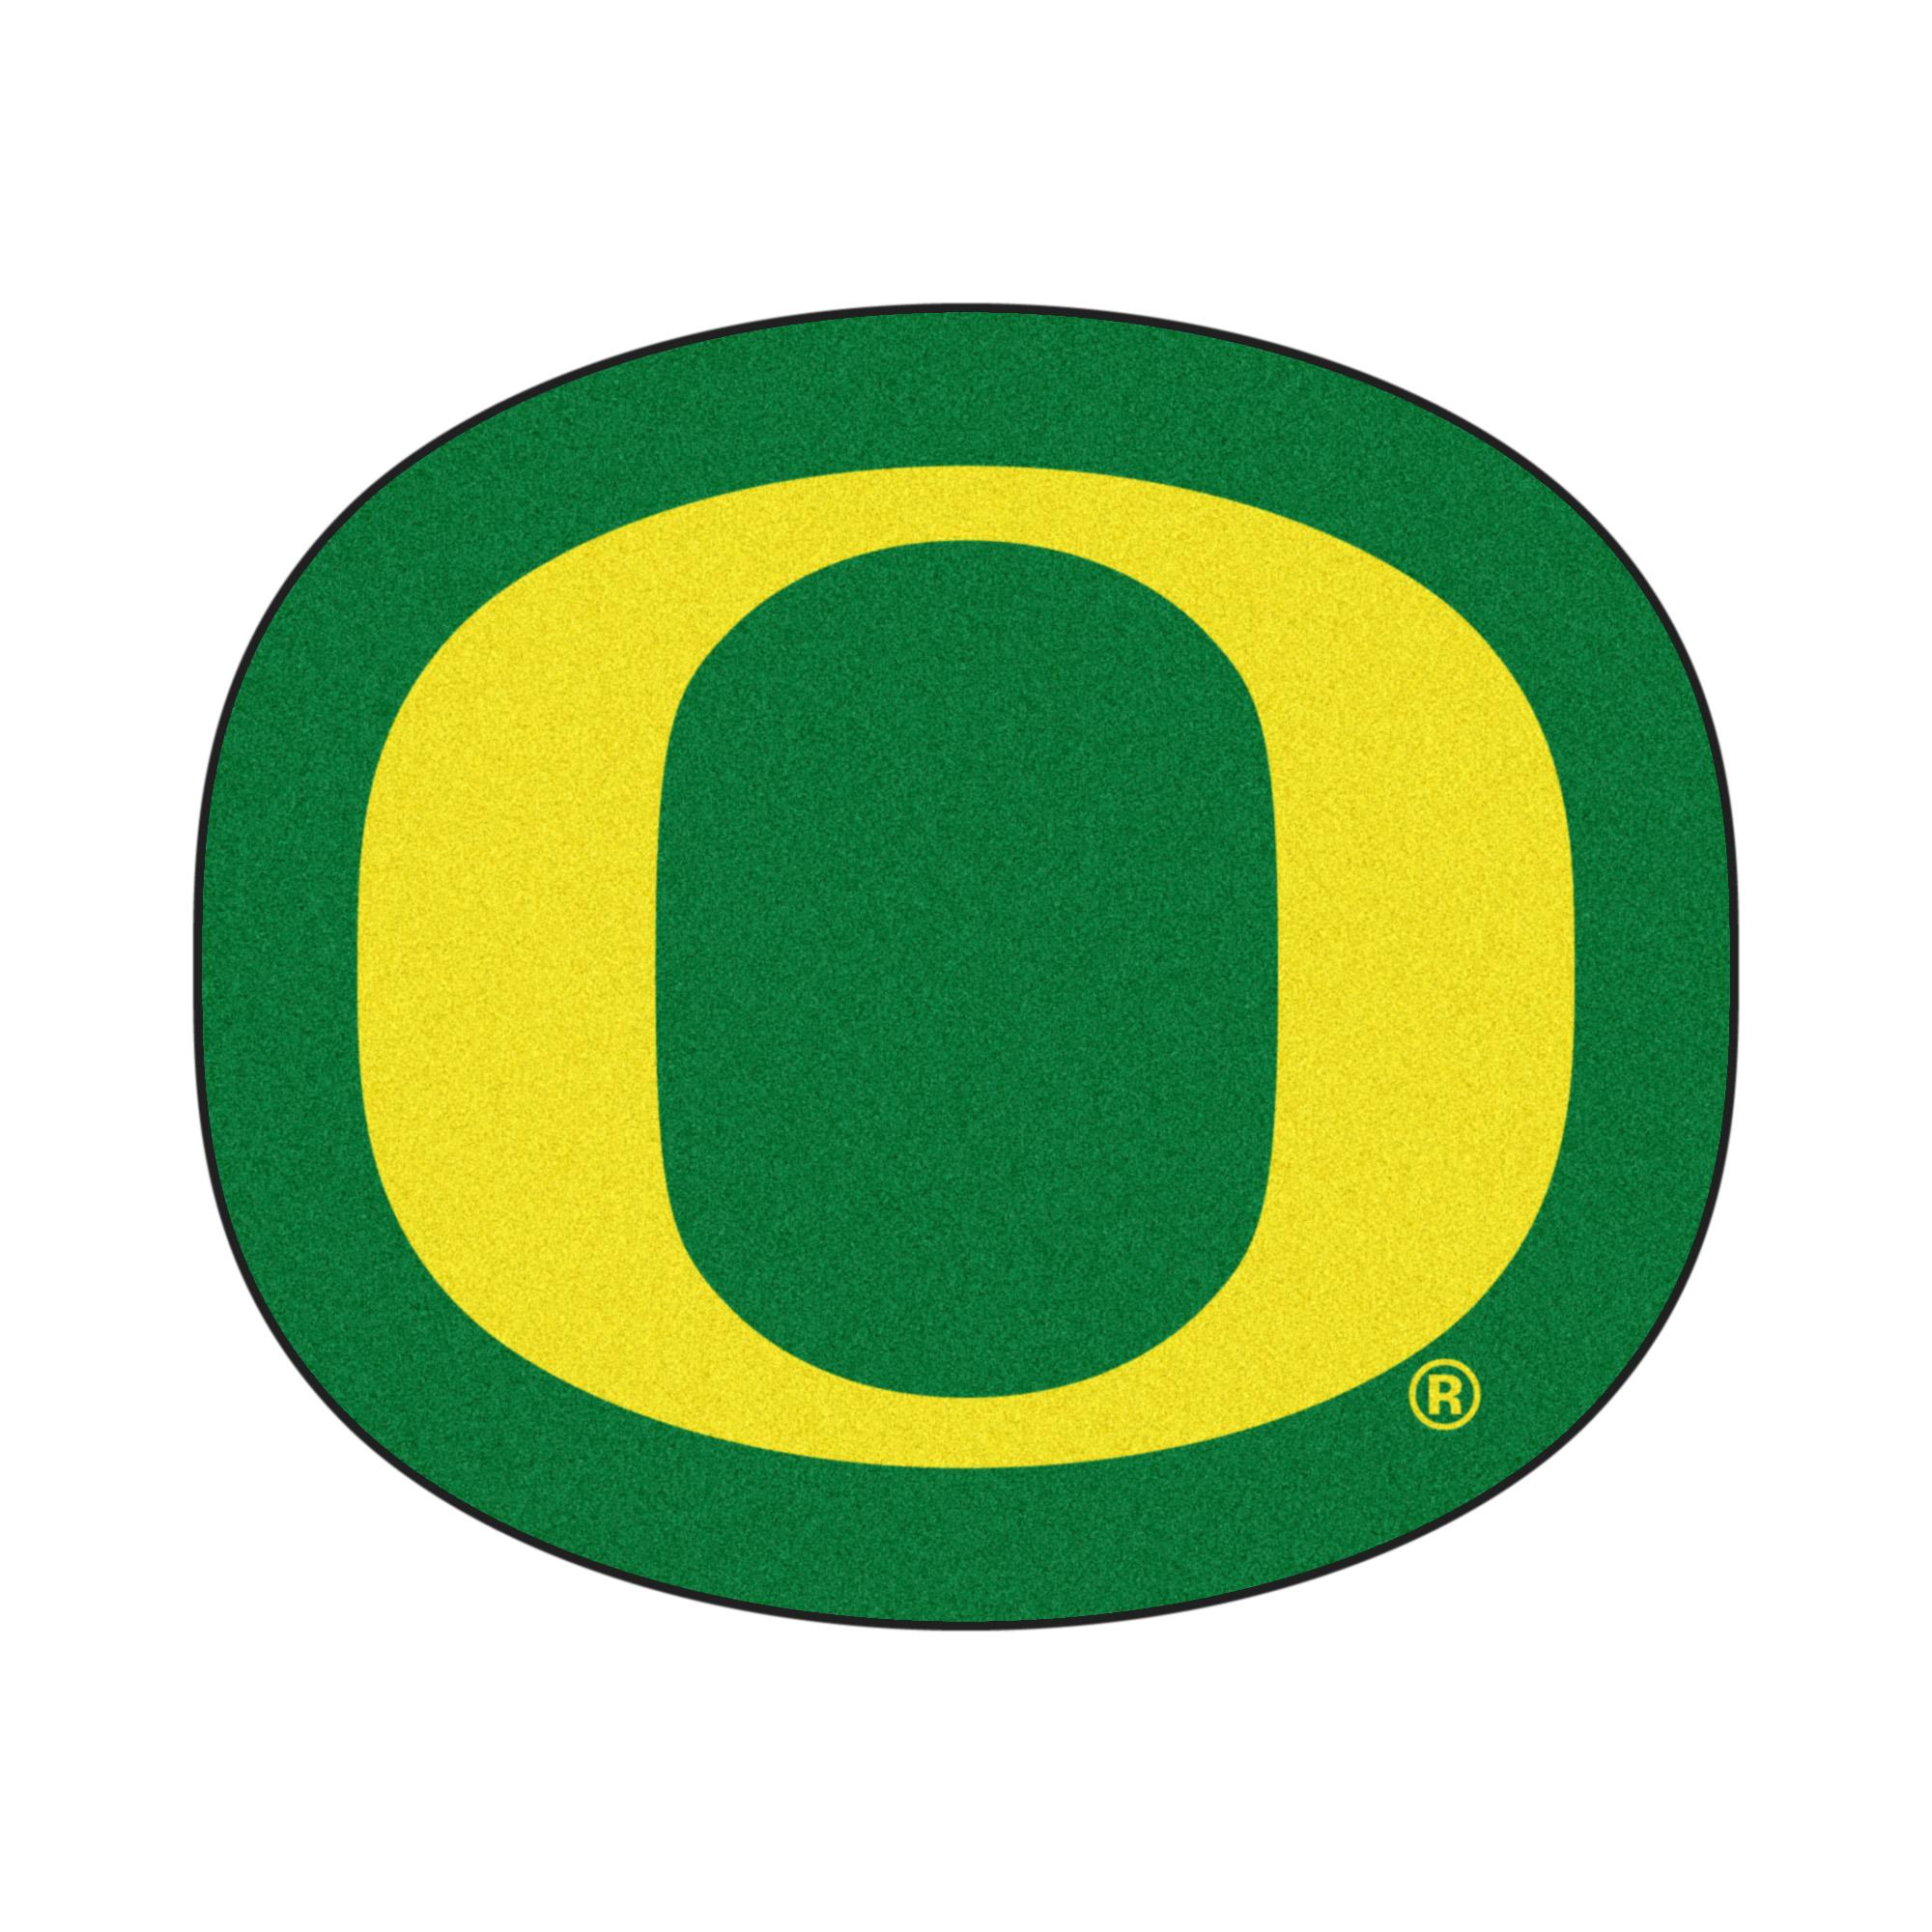 University of Oregon Logo Area Rug.